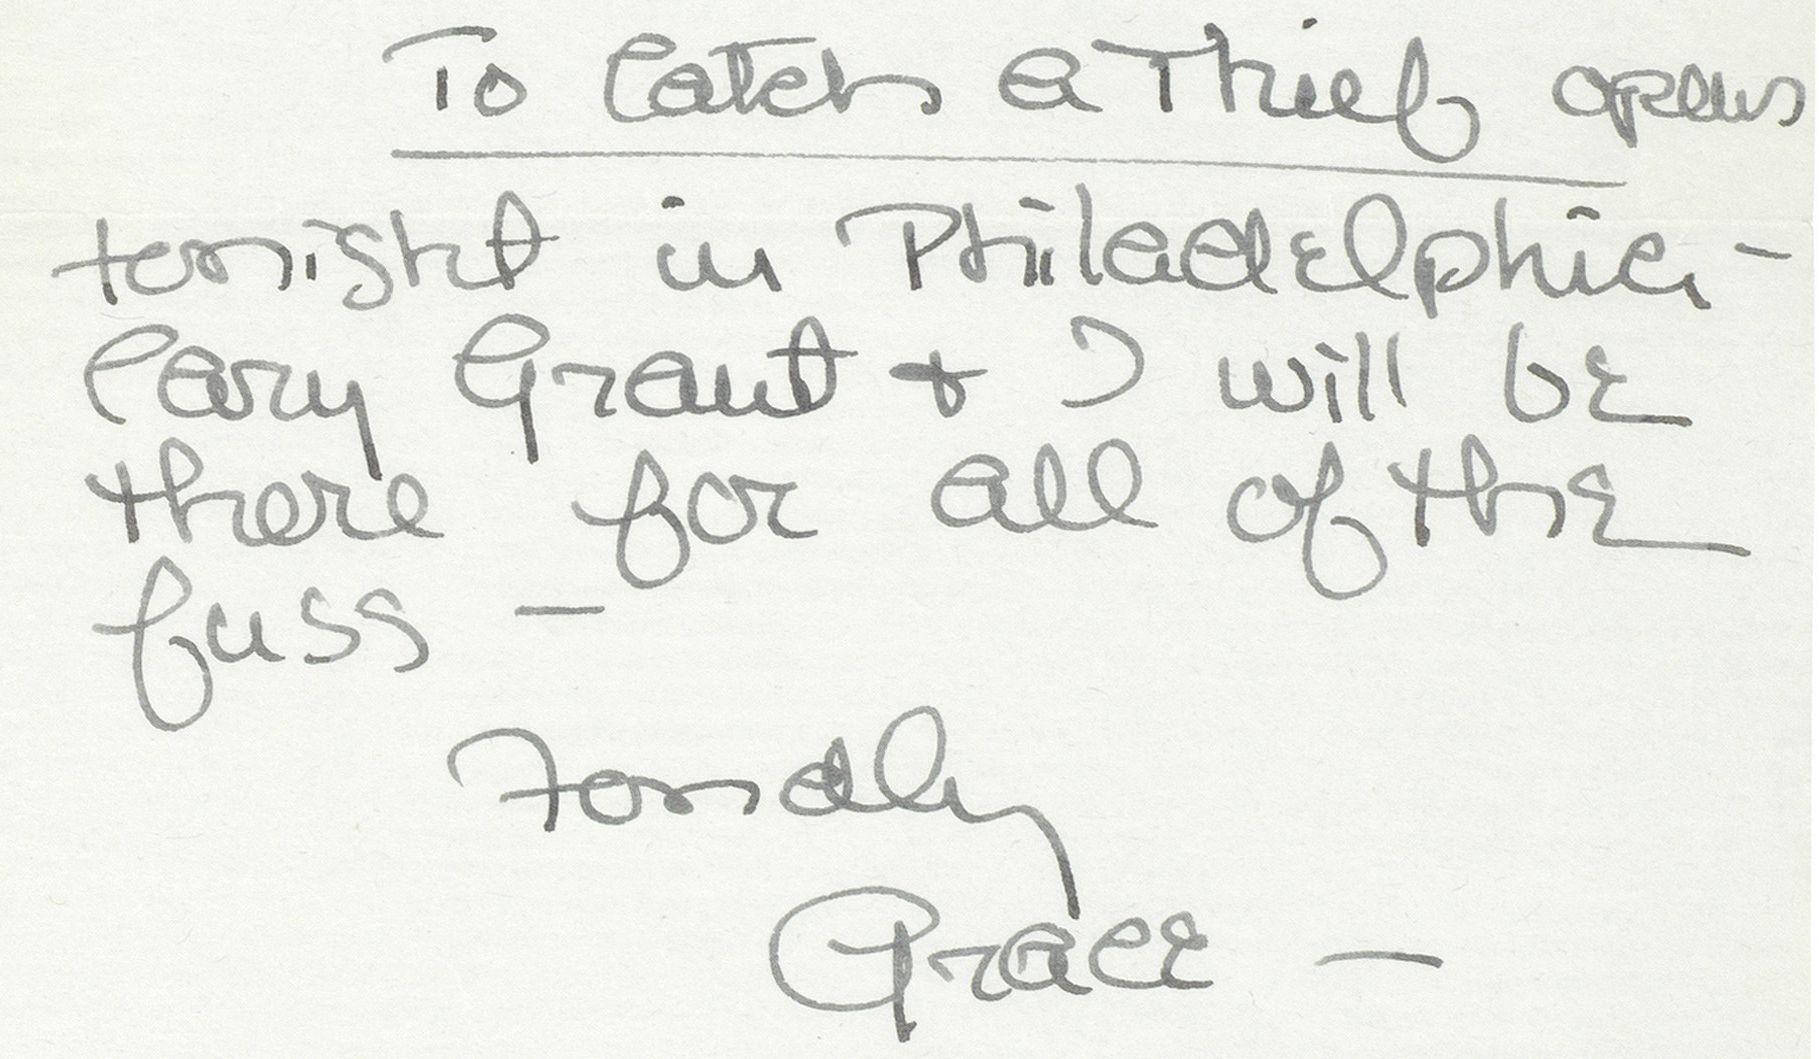 Lot 6 - Grace Kelly: A handwritten letter to Bing Crosby, undated, but 1955,